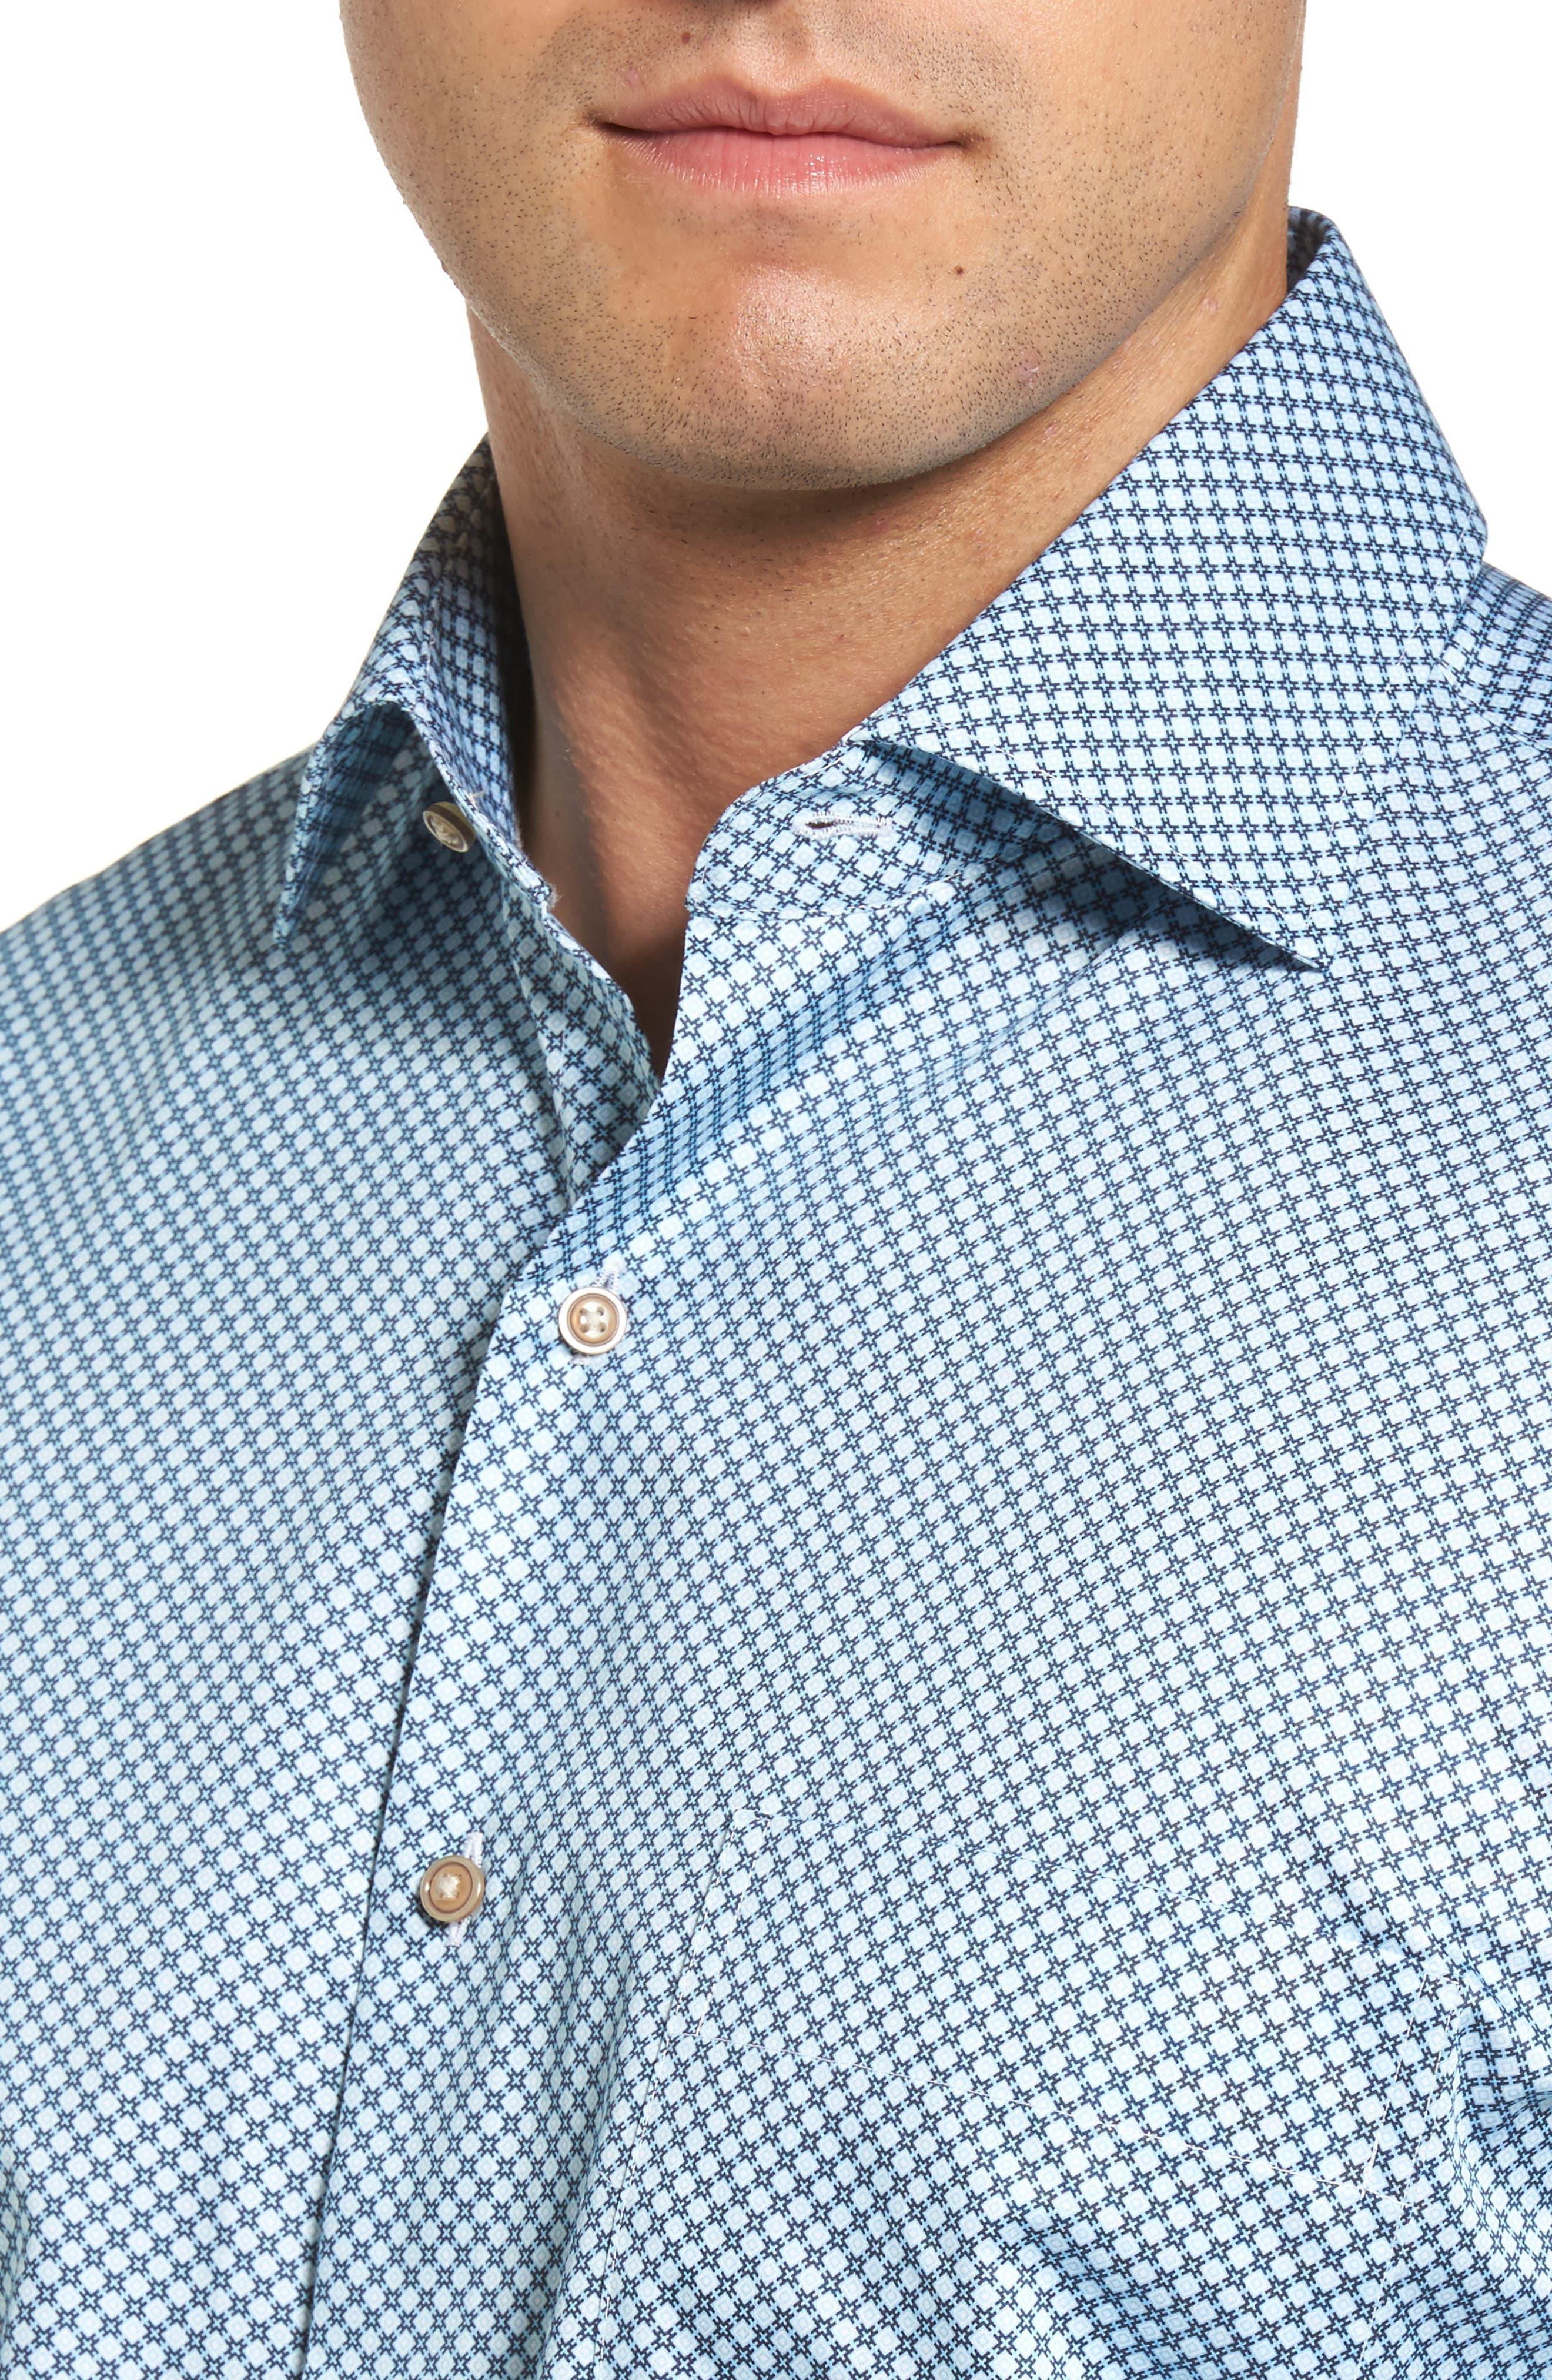 Pandora's Box Regular Fit Sport Shirt,                             Alternate thumbnail 4, color,                             437